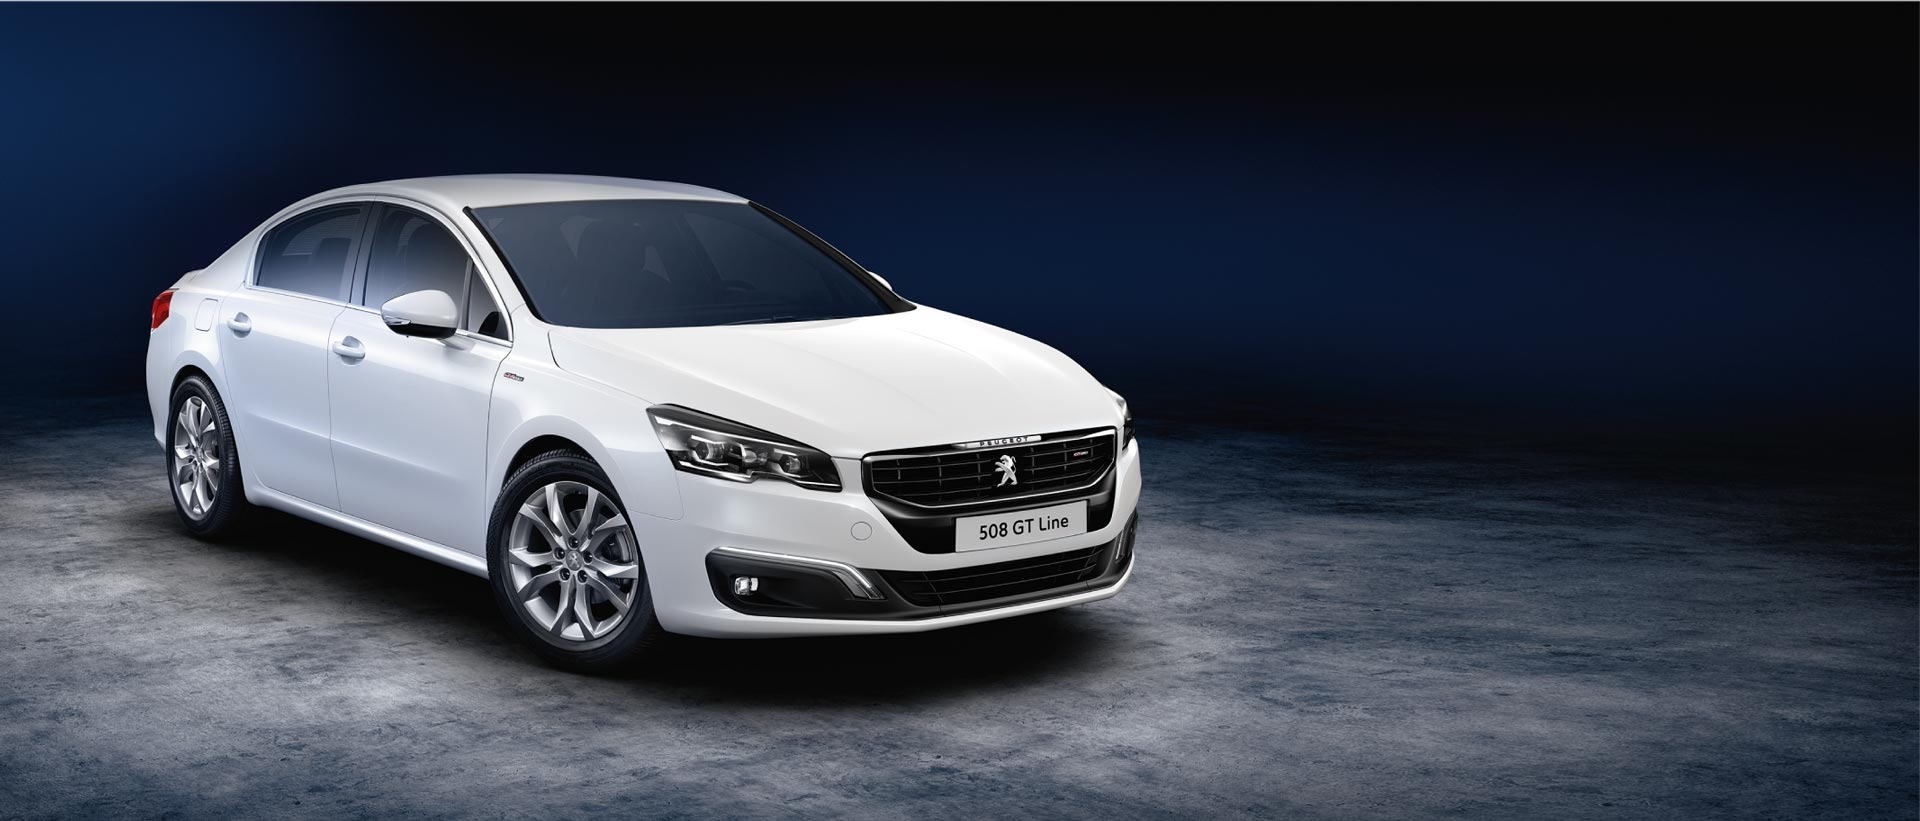 Peugeot New 508 GT Line